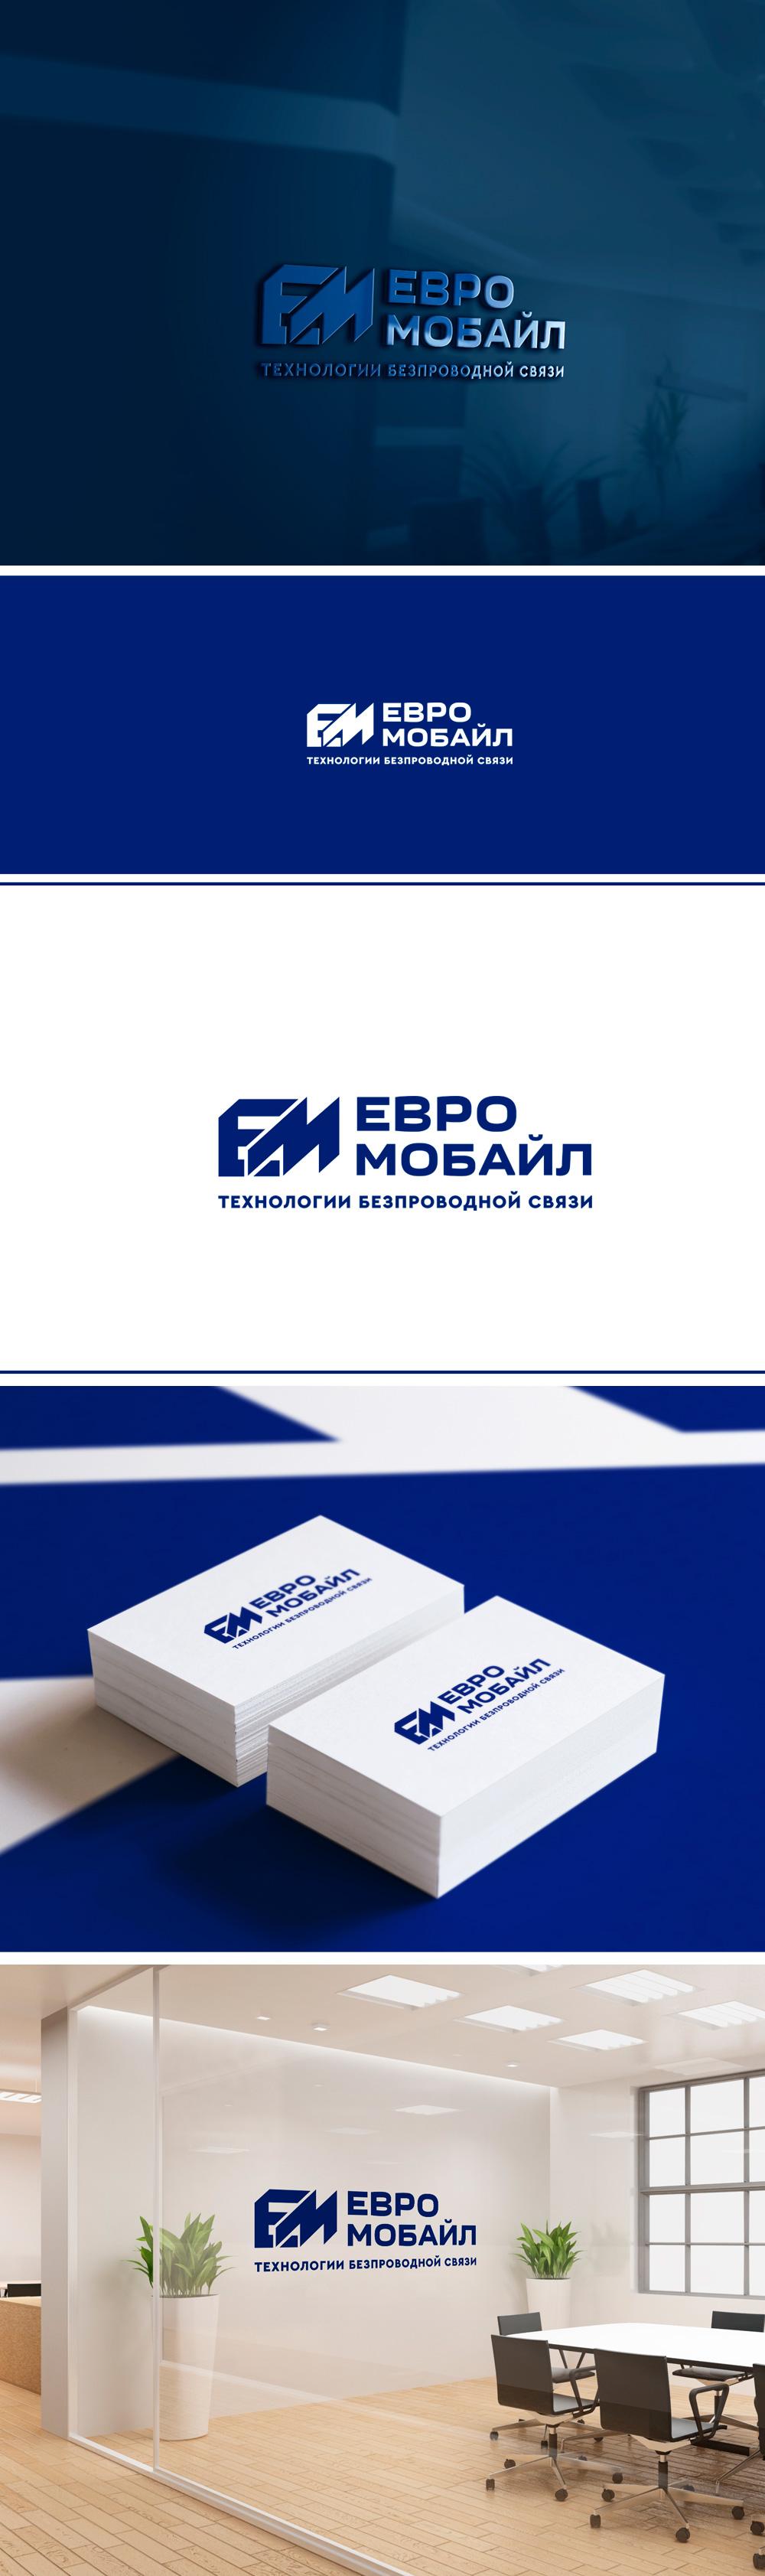 Редизайн логотипа фото f_97059bfafe2ad4fe.jpg